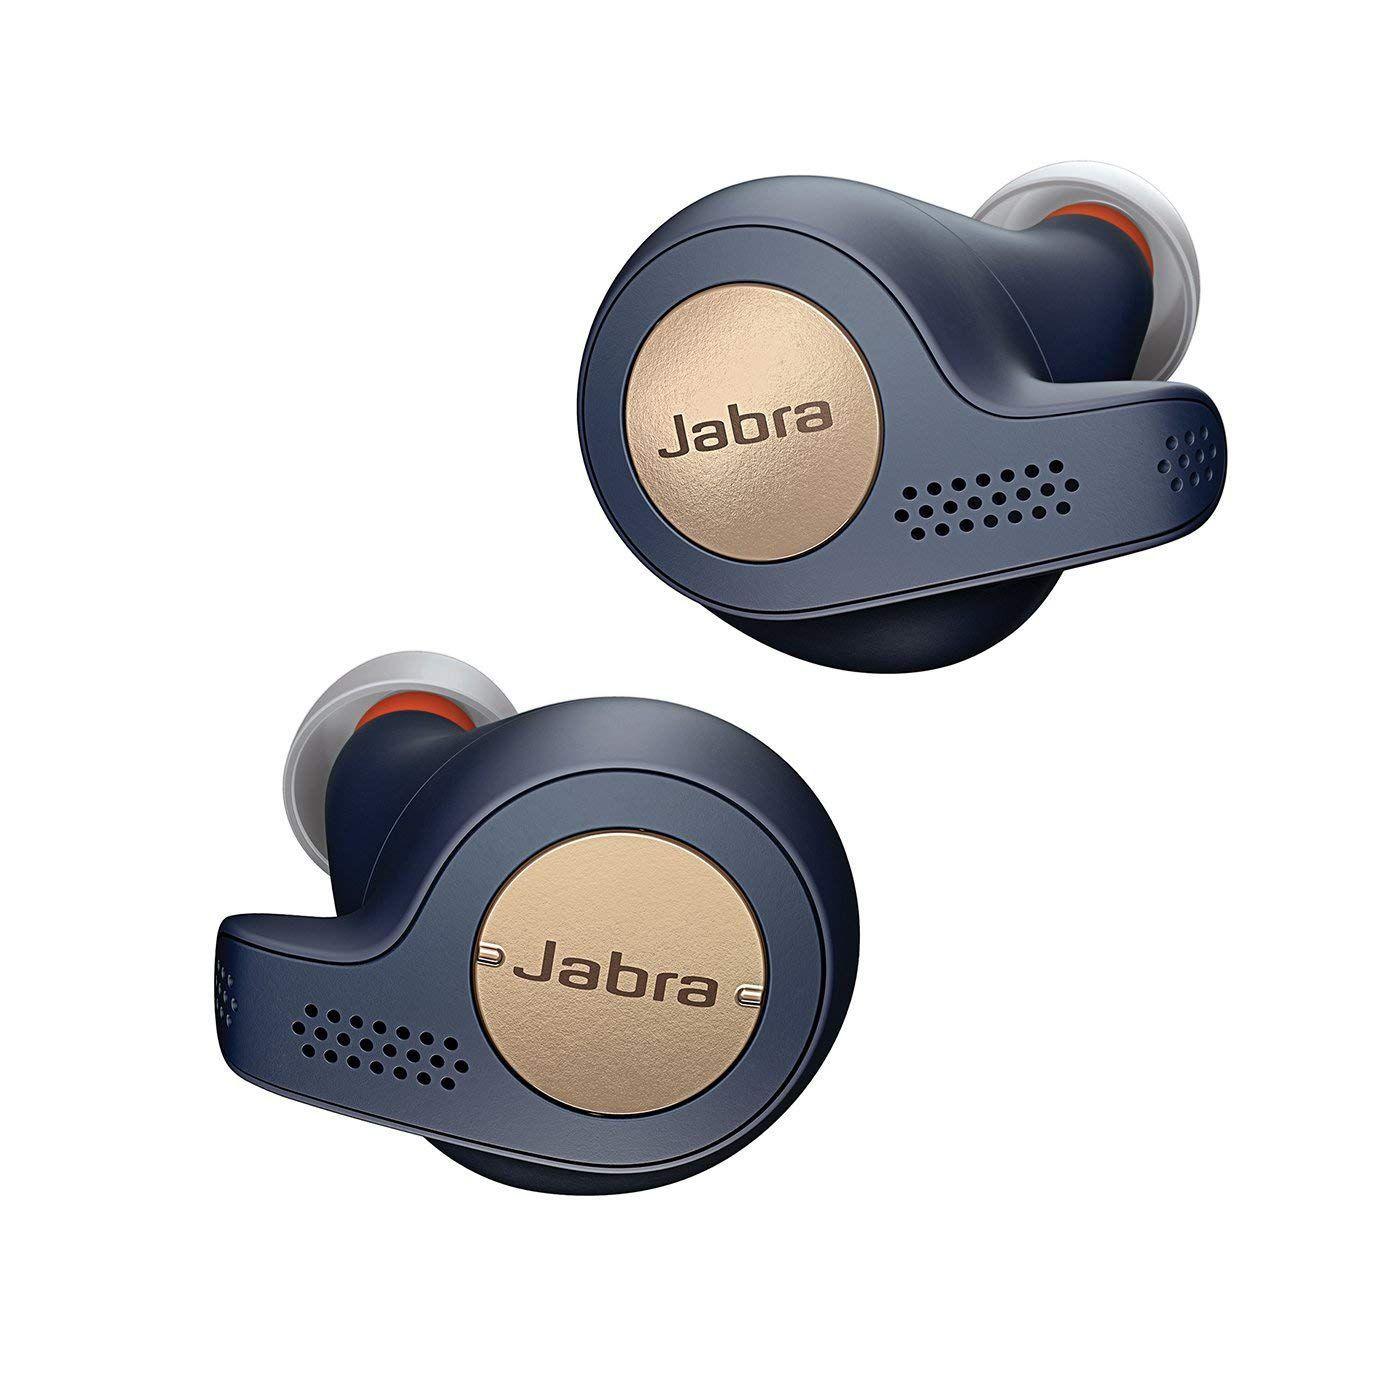 The 5 Best New Headphones Of 2018 Wireless sport earbuds